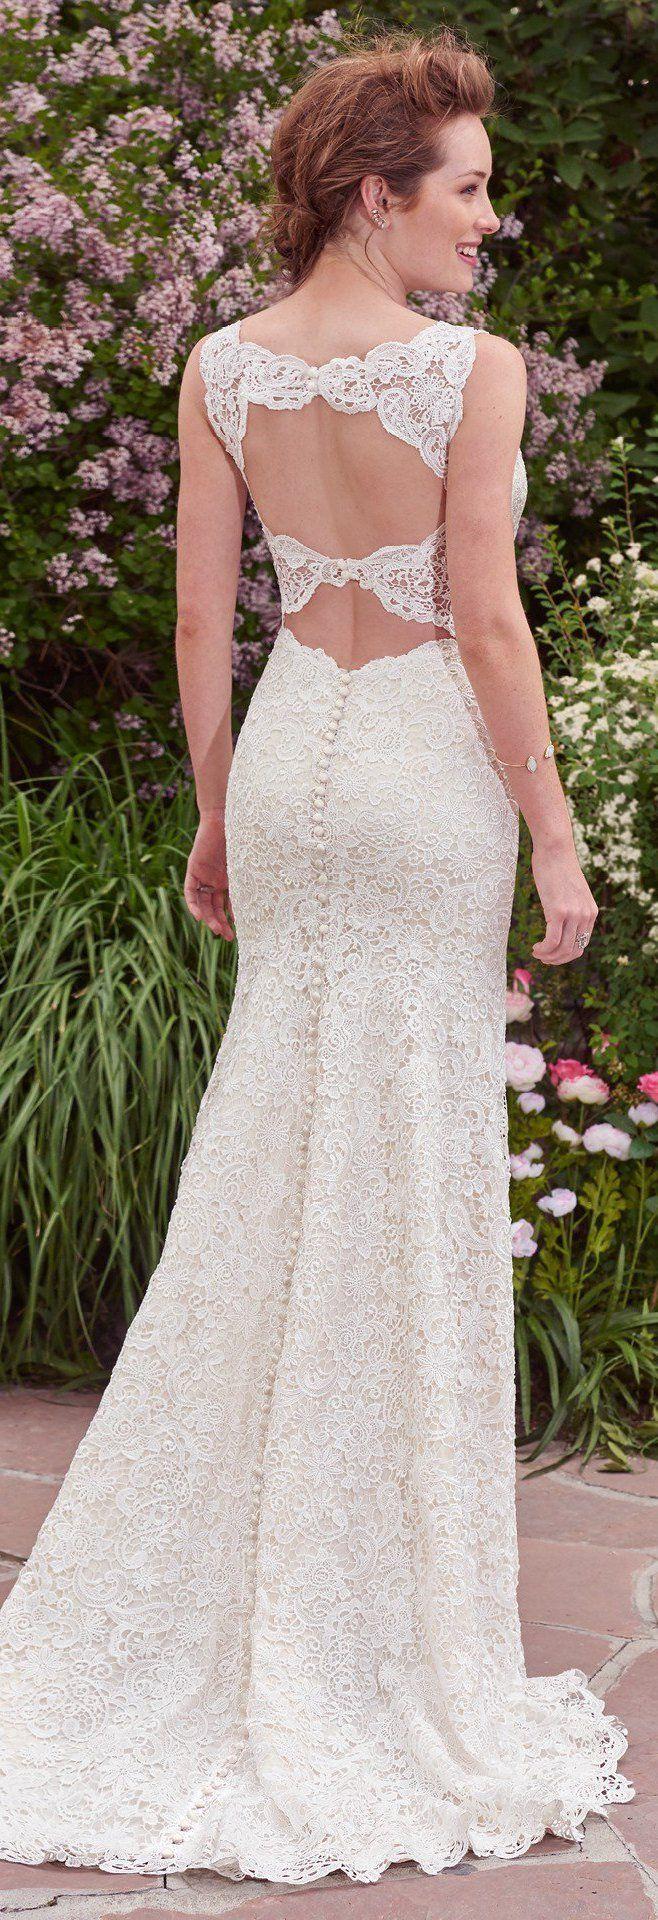 Wedding Dress by Rebecca Ingram - Hope | Less than $1,000 | #rebeccaingram #rebeccabride